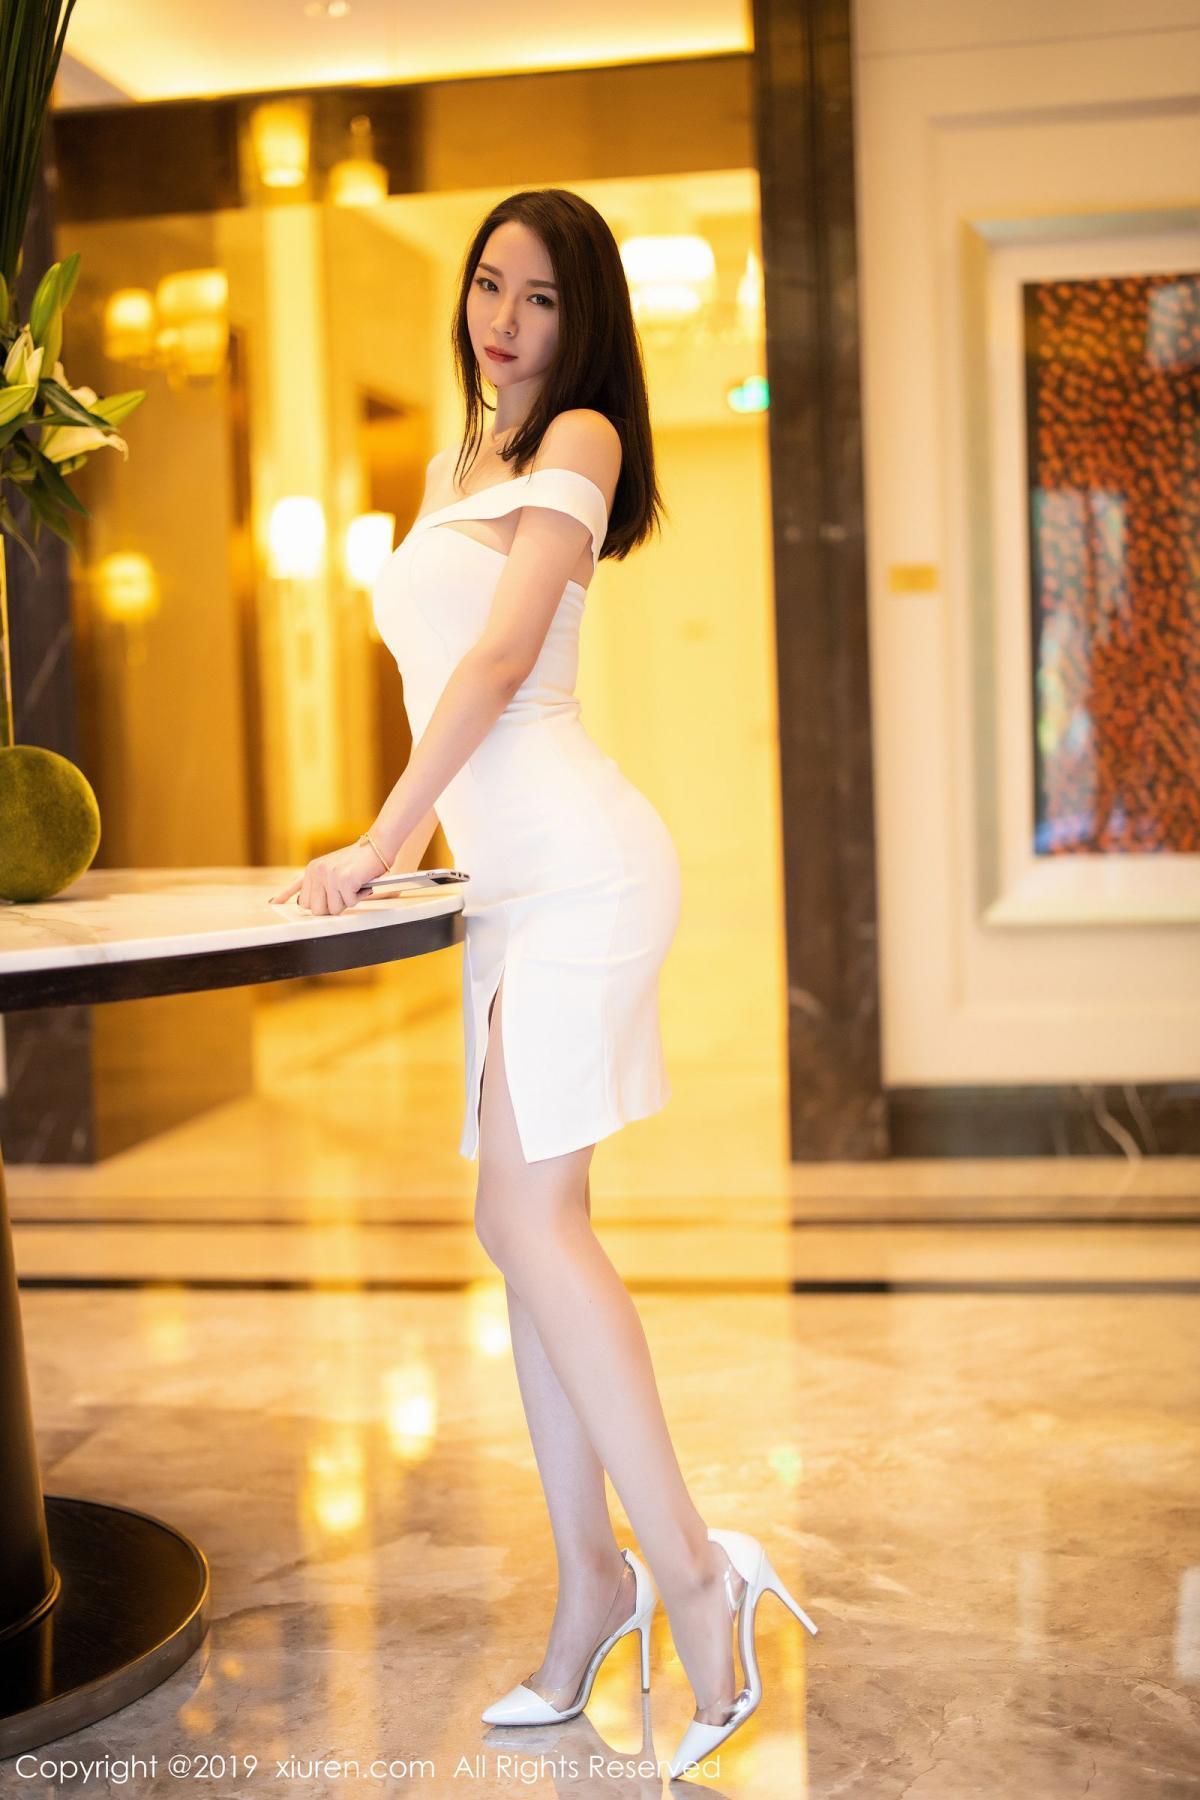 [XiuRen] Vol.1861 Meng Xin Yue 13P, Meng Xin Yue, Tall, Temperament, Uniform, Xiuren